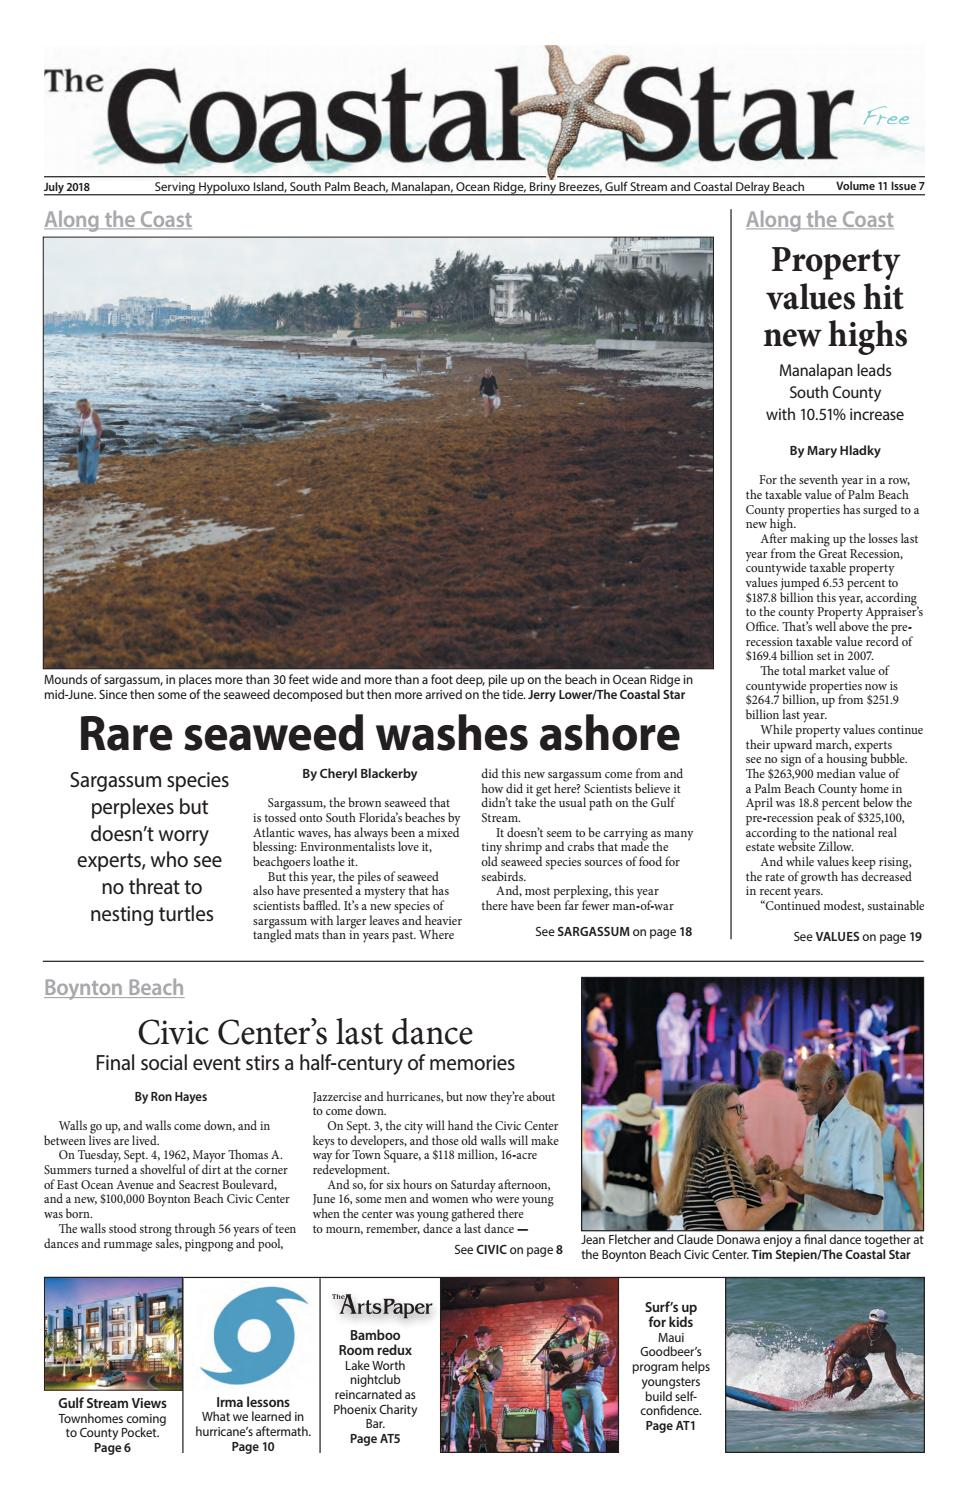 The Coastal Star July 2018 by The Coastal Star - issuu